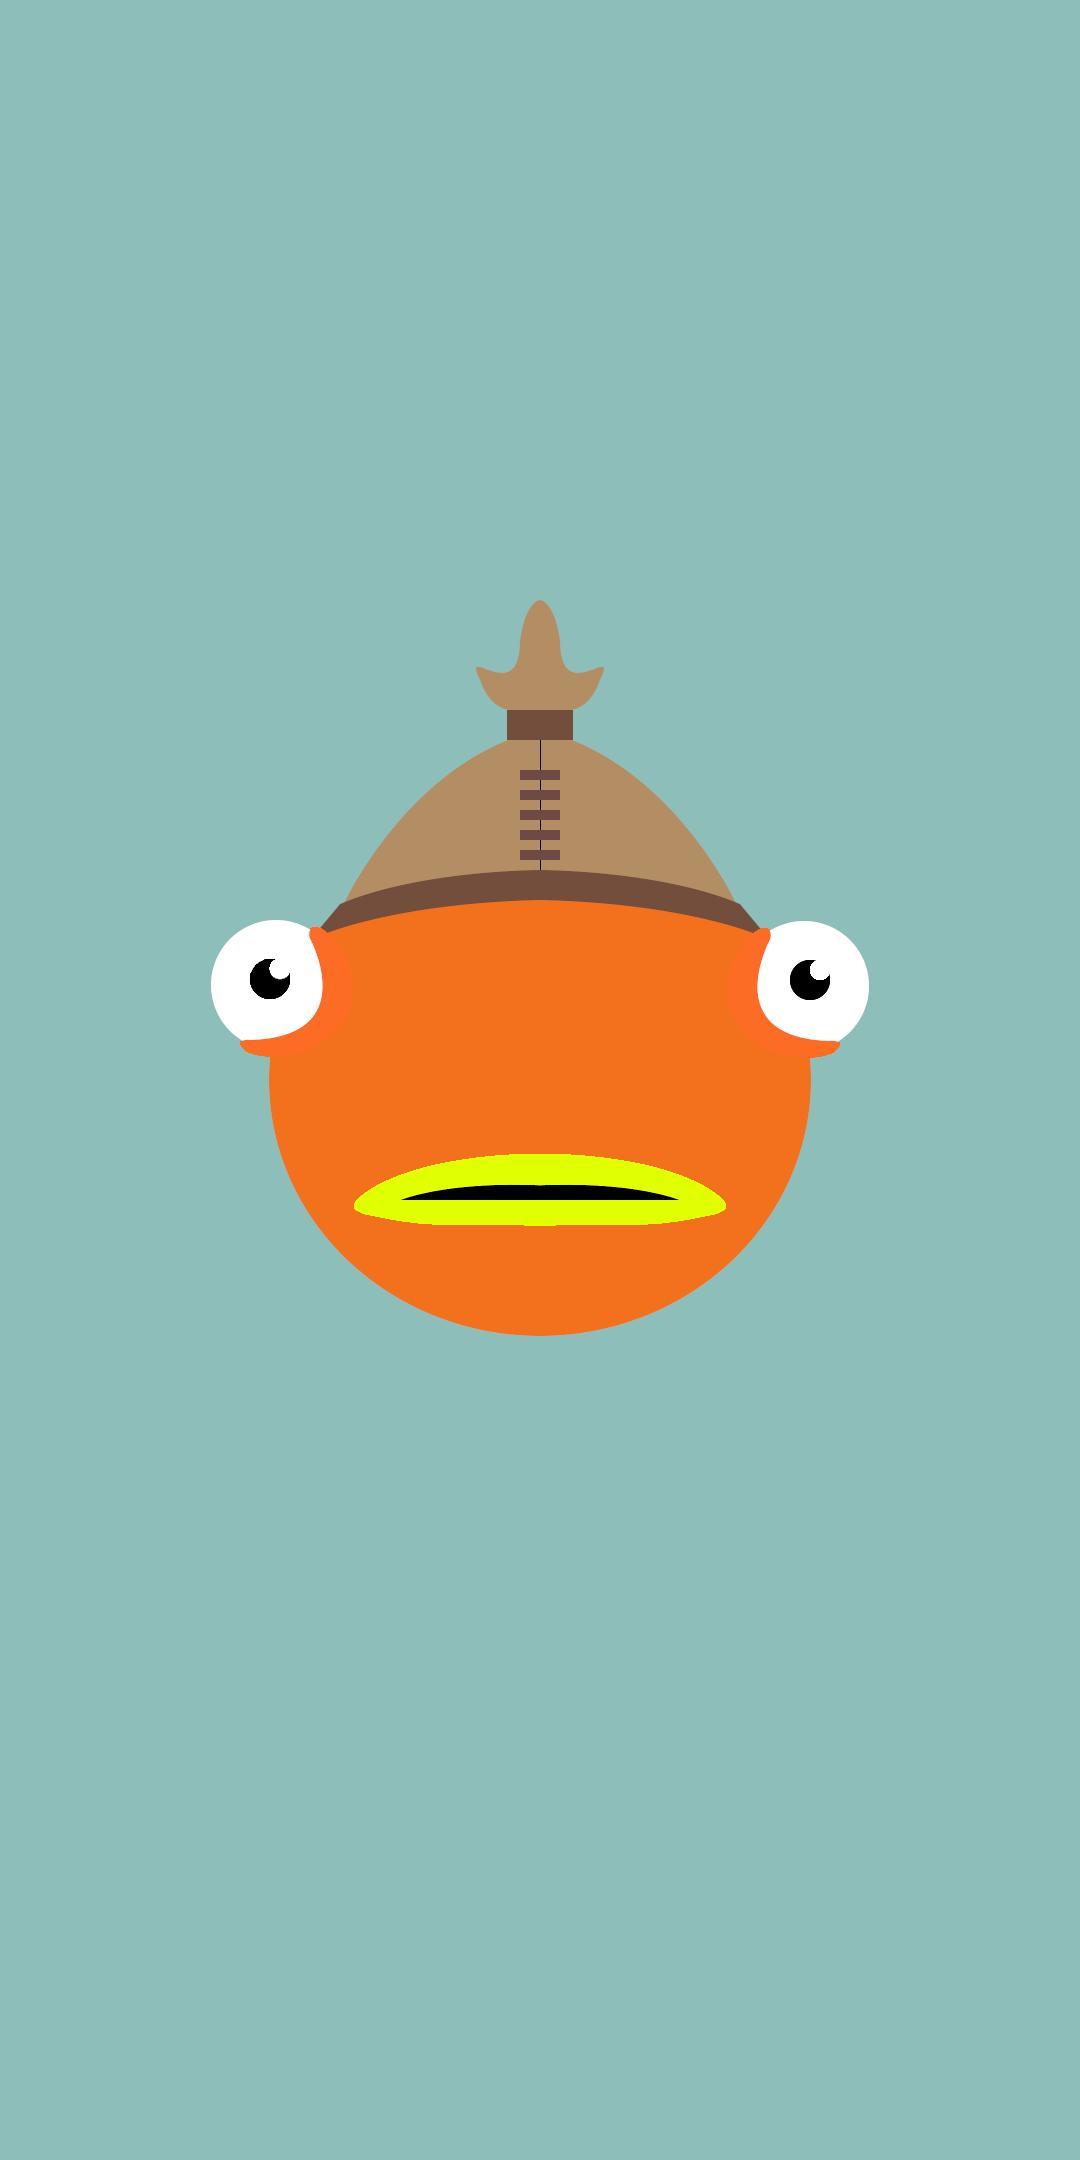 I made a Fishstick Mobile Wallpaper ShrineOfFishstick 1080x2160